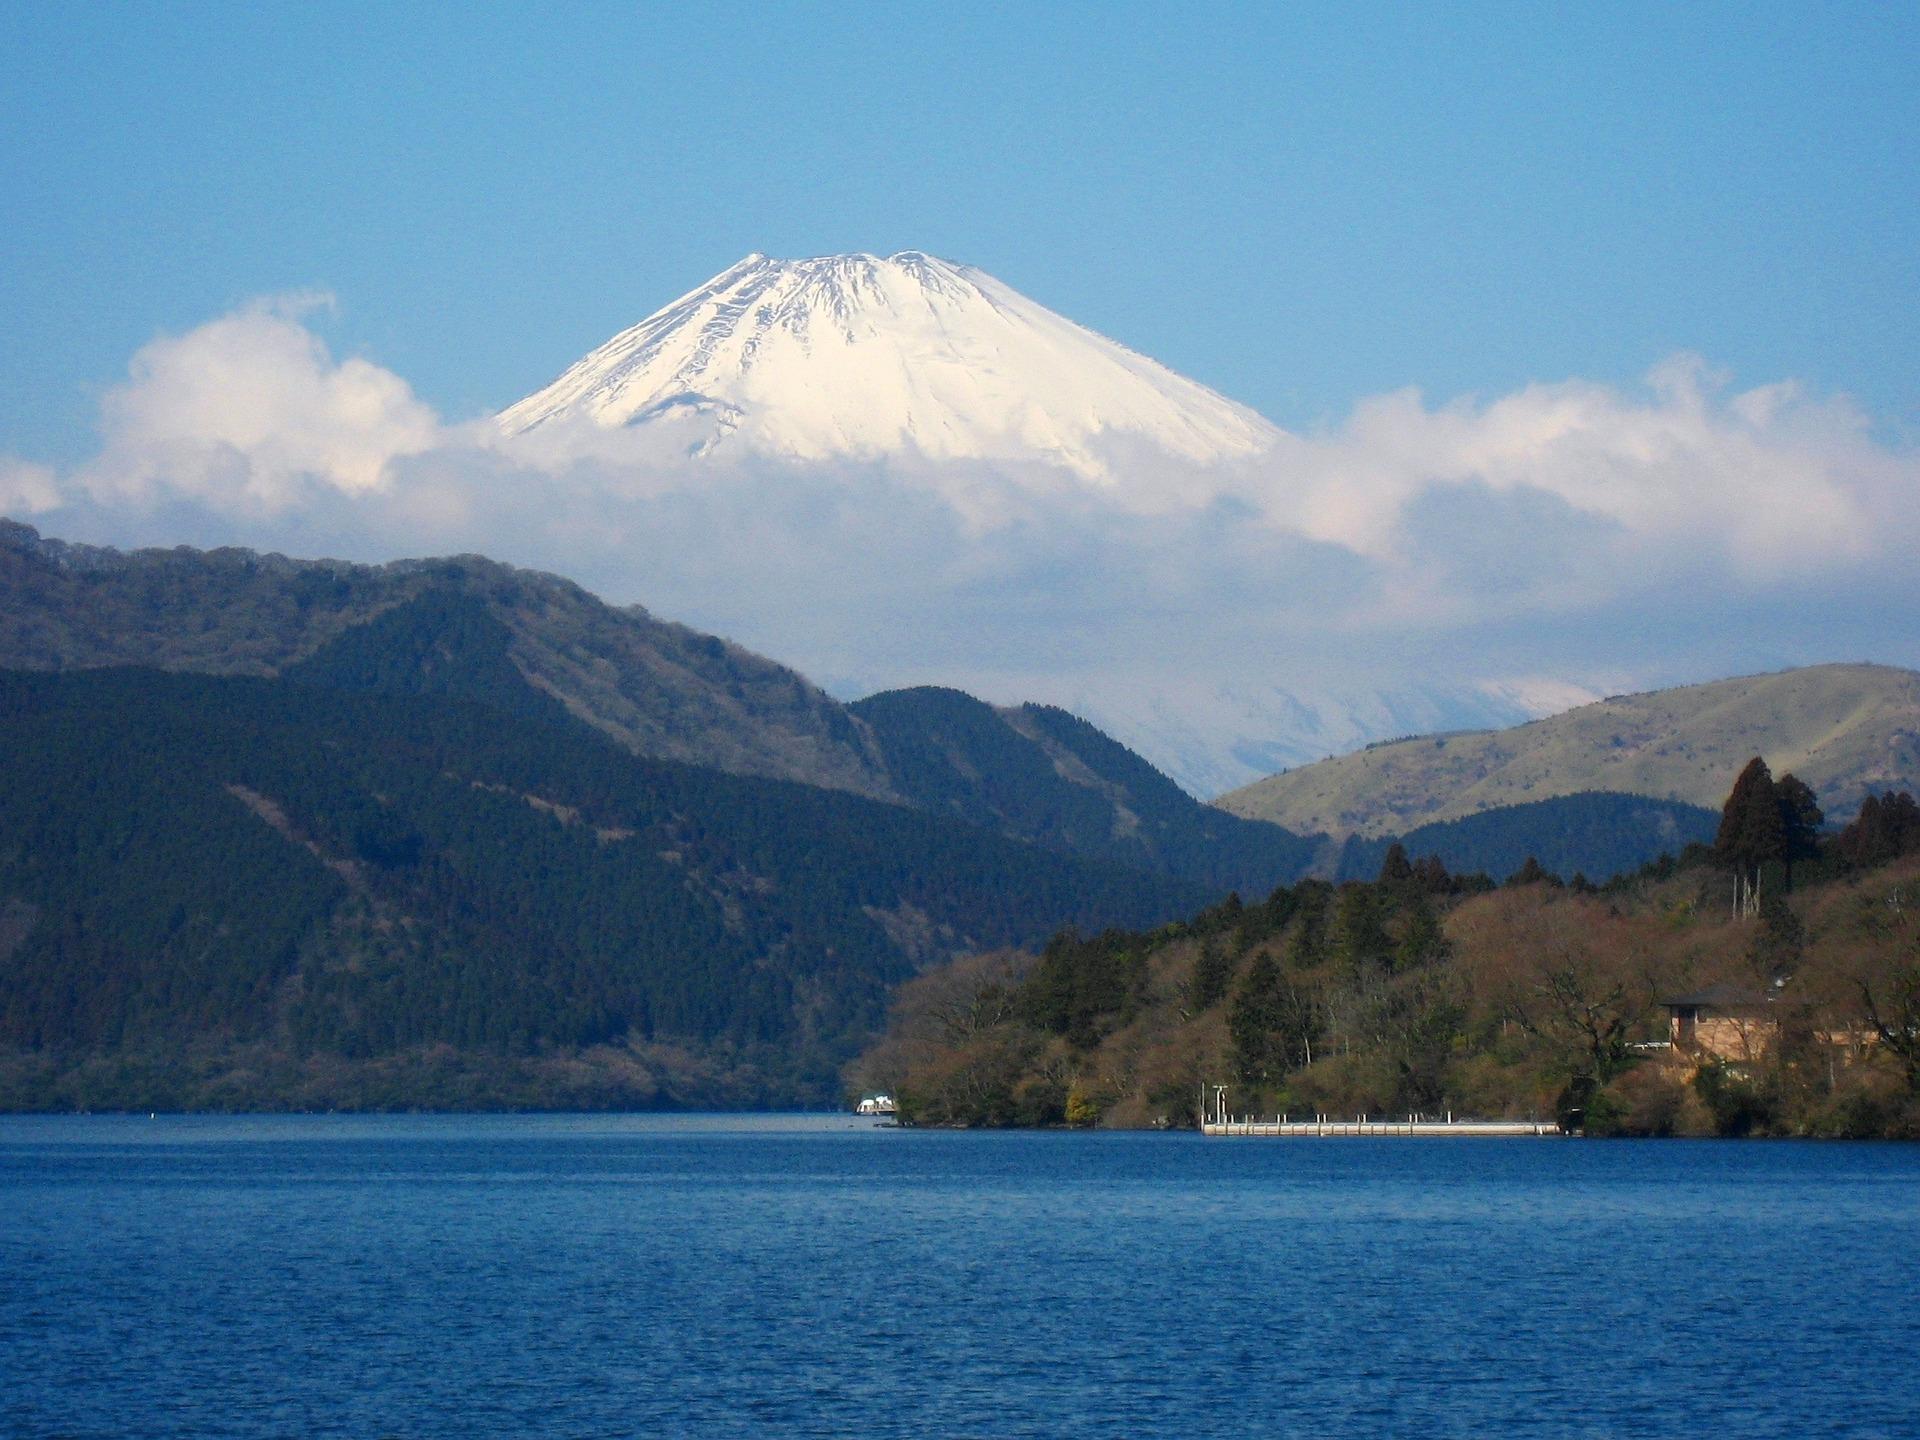 Lake Ashi, Kanagawa